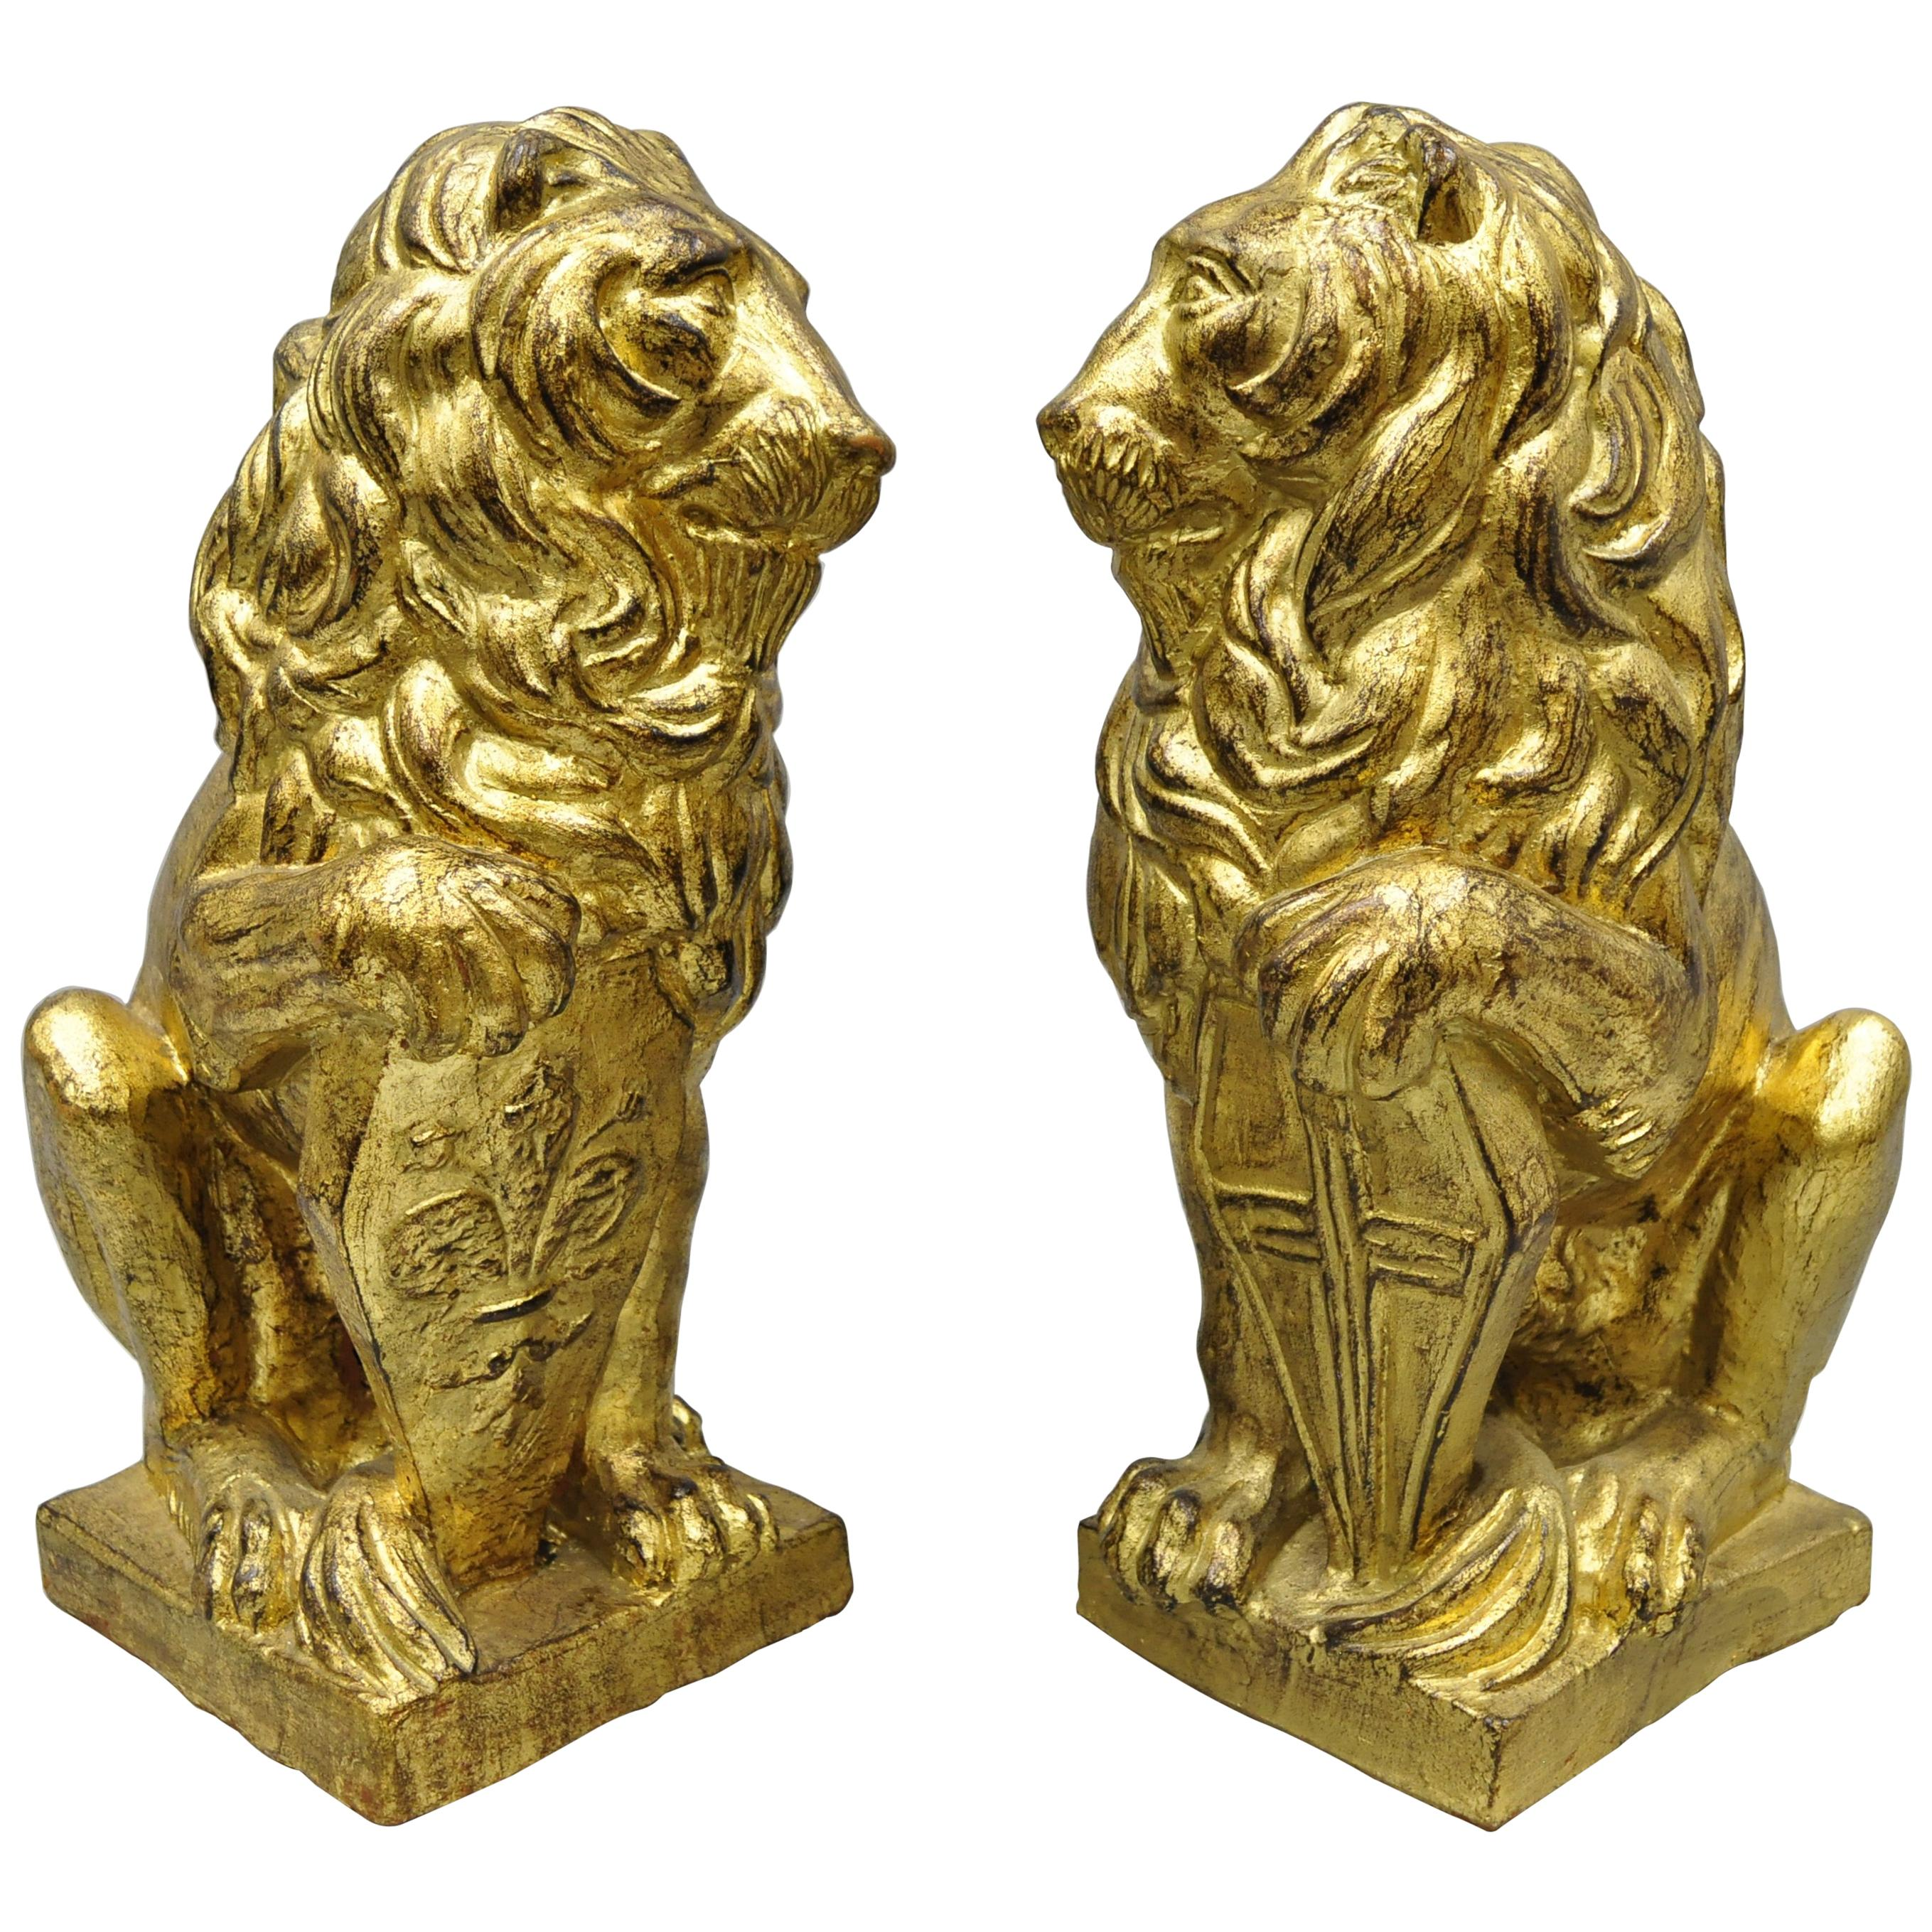 Pair of Italian Terracotta Gold Leaf Lion Statues Sculpture